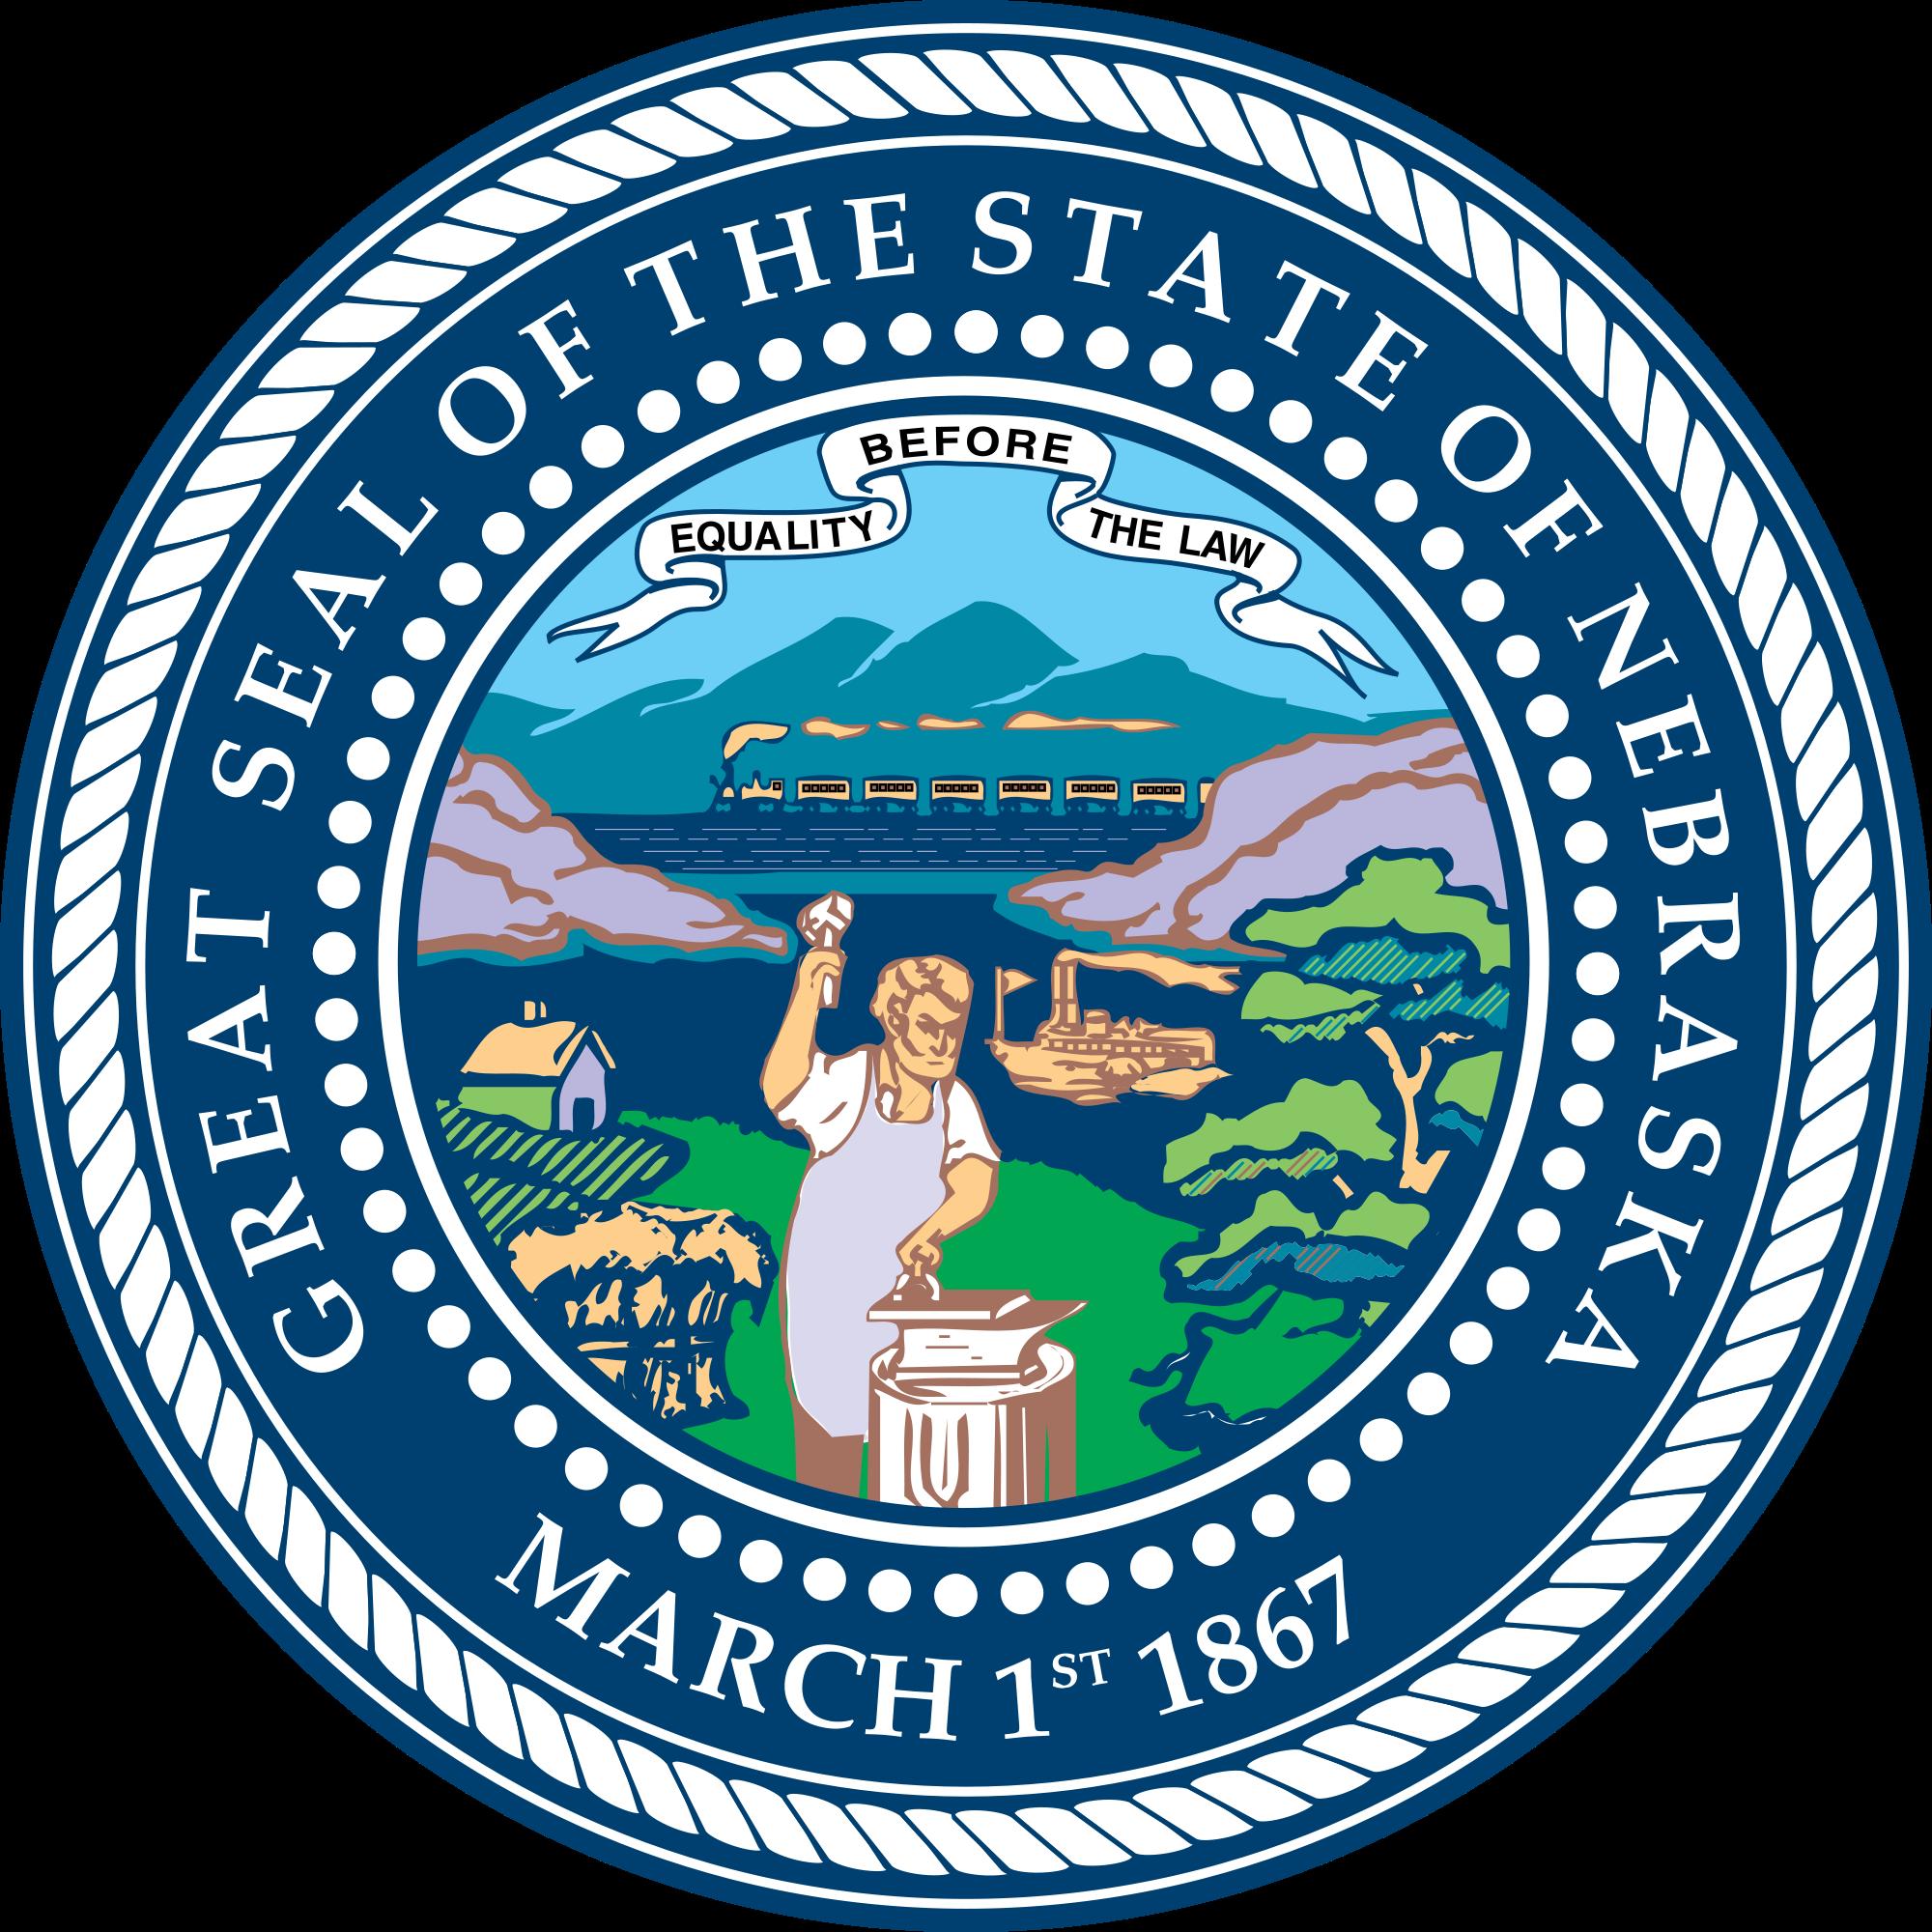 Nebraska Wedding Laws - Universal Life Church